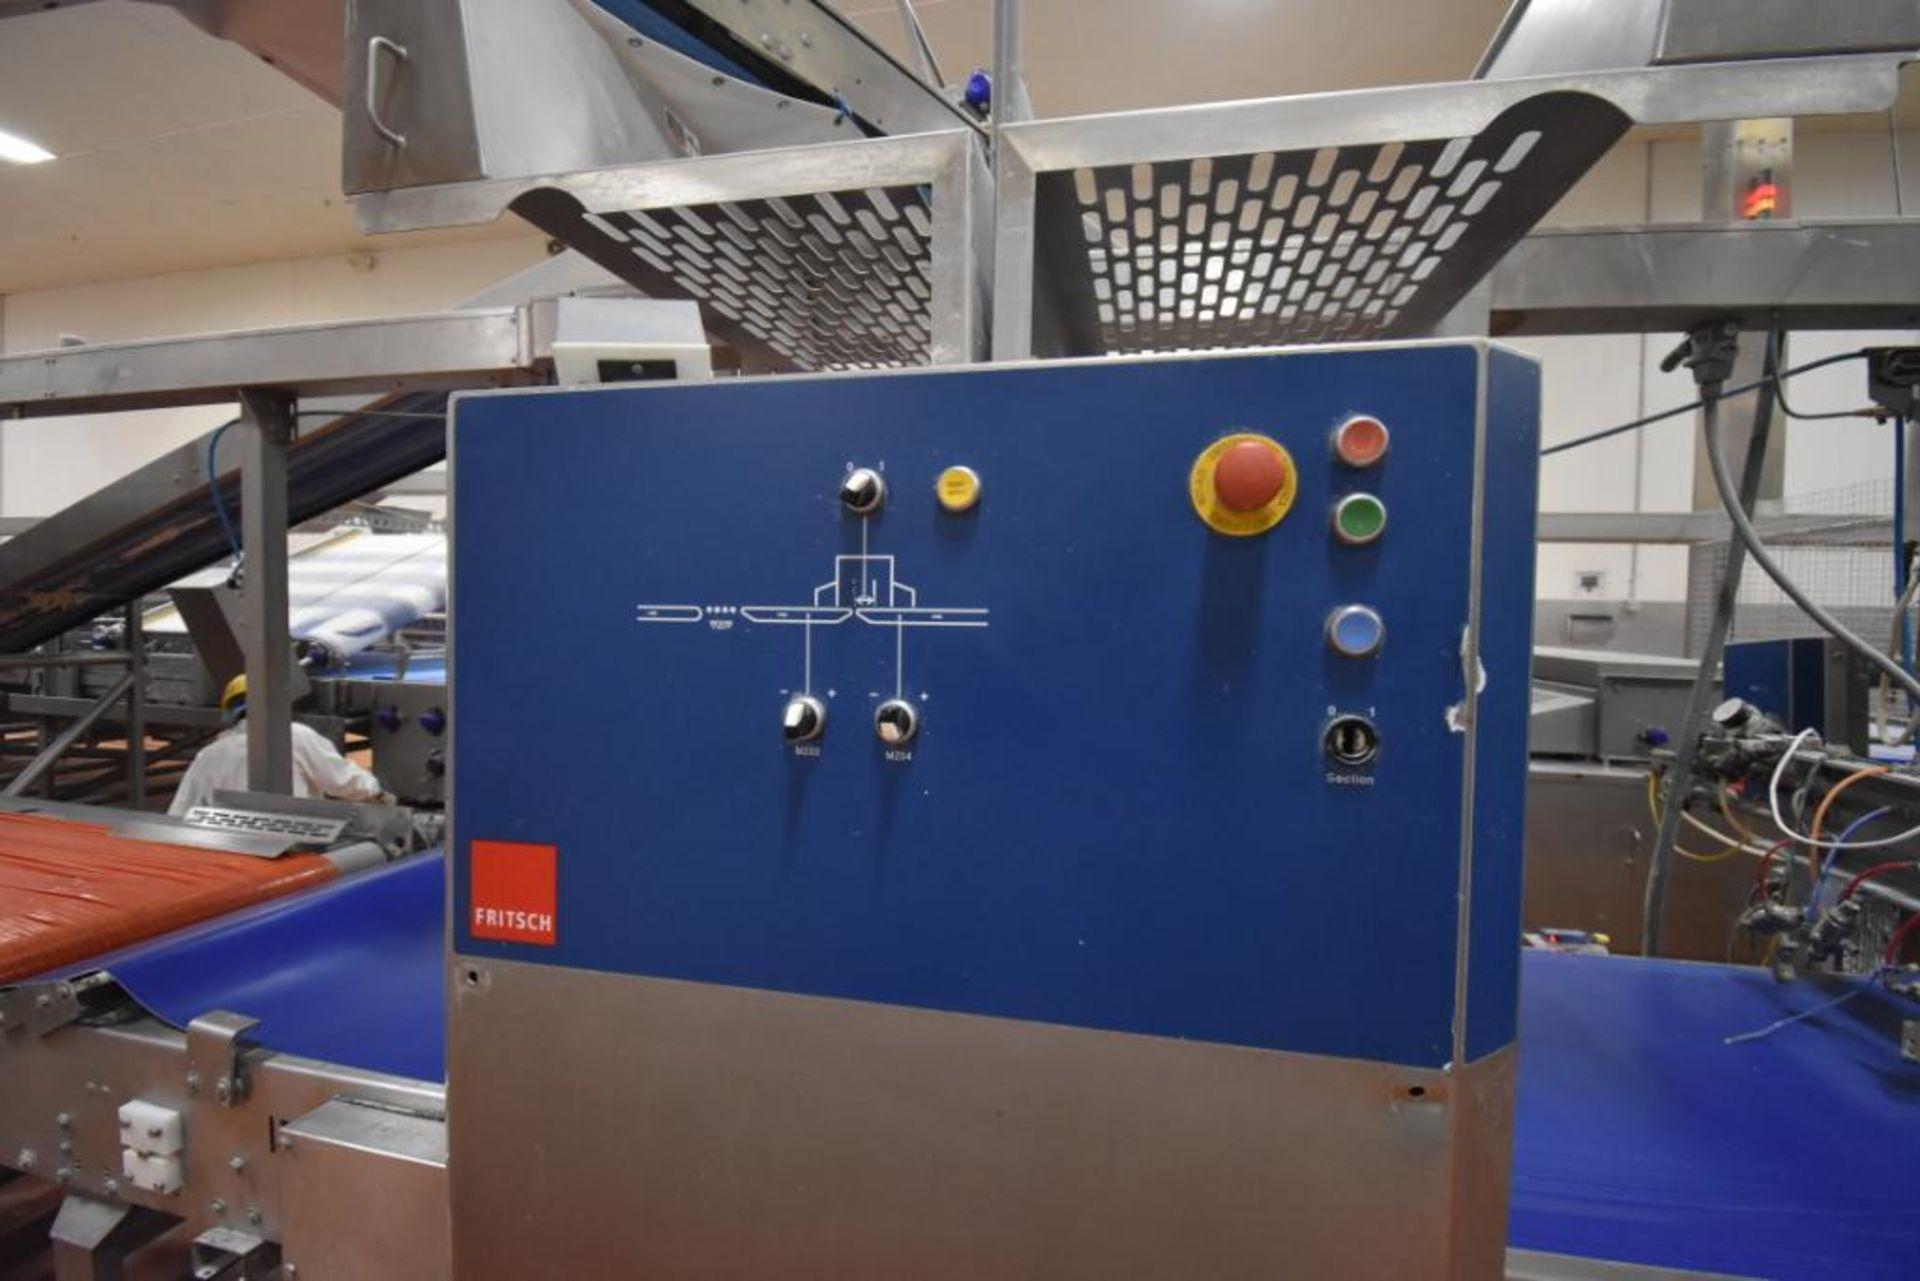 2007 Fritsch Laminator 3000 dough line - Image 165 of 280